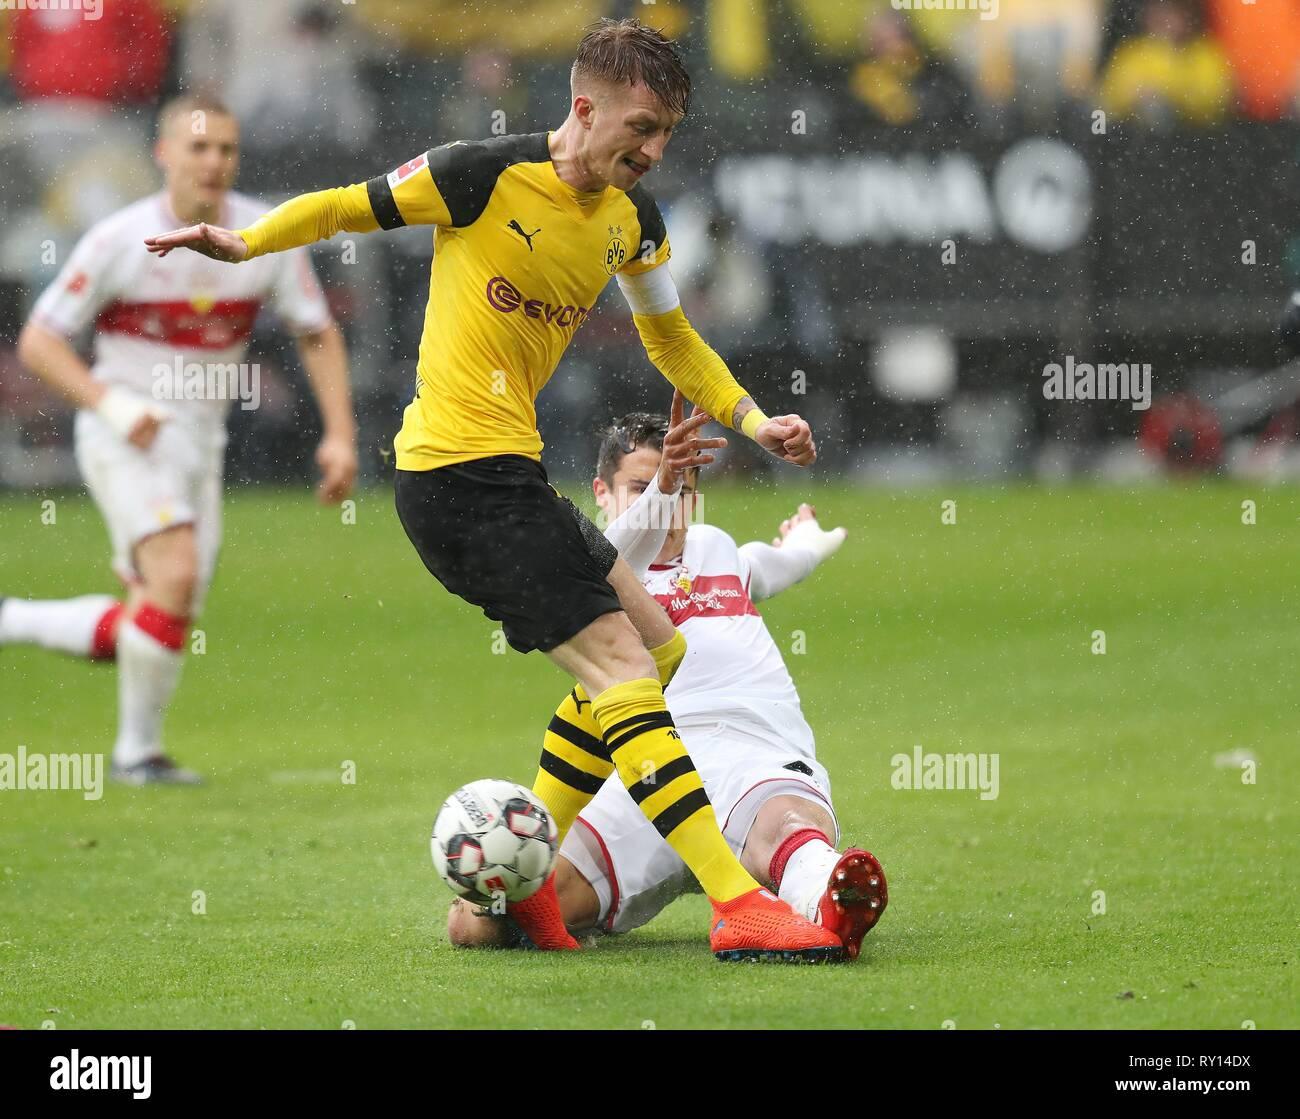 Dortmund, Deutschland. 09th Mar, 2019. firo: 09.03.2019, Football, 2018/2019, 1.Bundesliga BVB Borussia Dortmund - VfB Stuttgart 3: 1 Marco Reus, duels | Credit: dpa/Alamy Live News - Stock Image